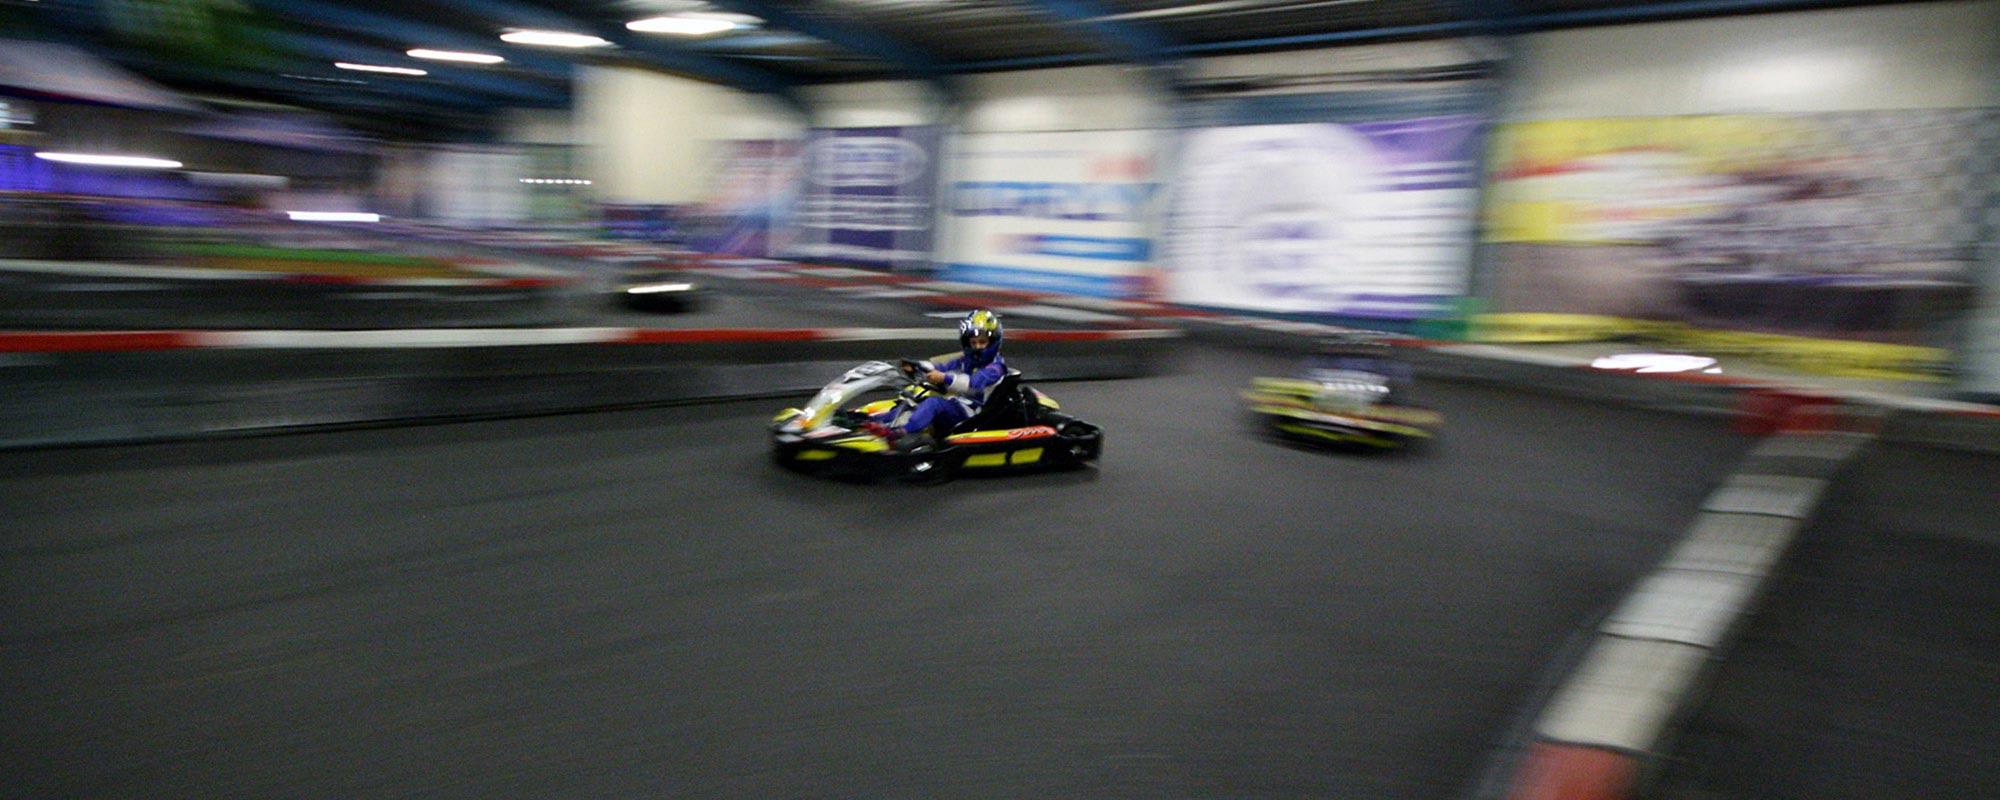 ebafkc-juniorkarting-2000x800-17